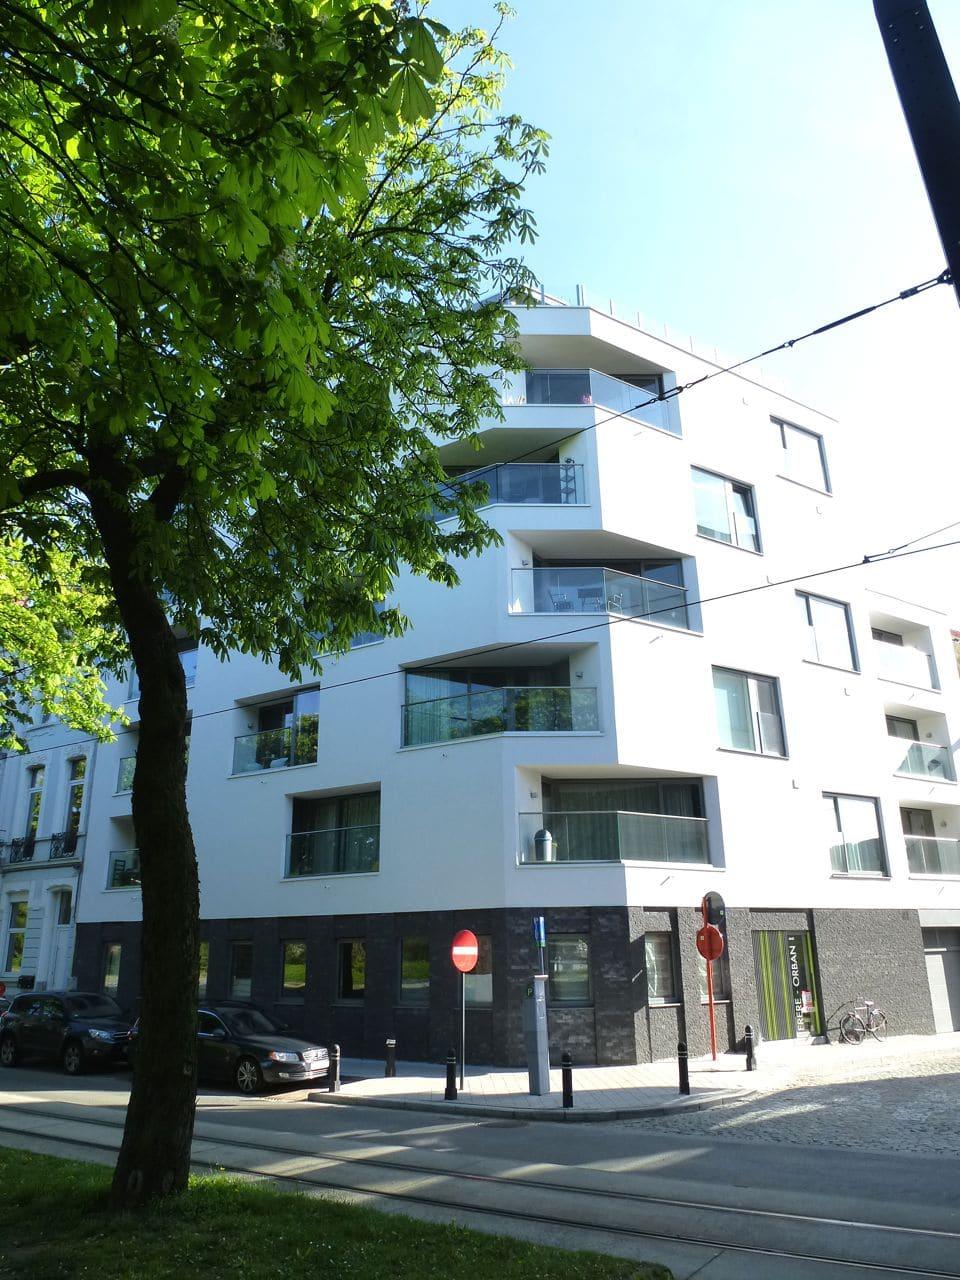 P1120407 | Baeyens & Beck architecten Gent | architect nieuwbouw renovatie interieur | high end | architectenbureau